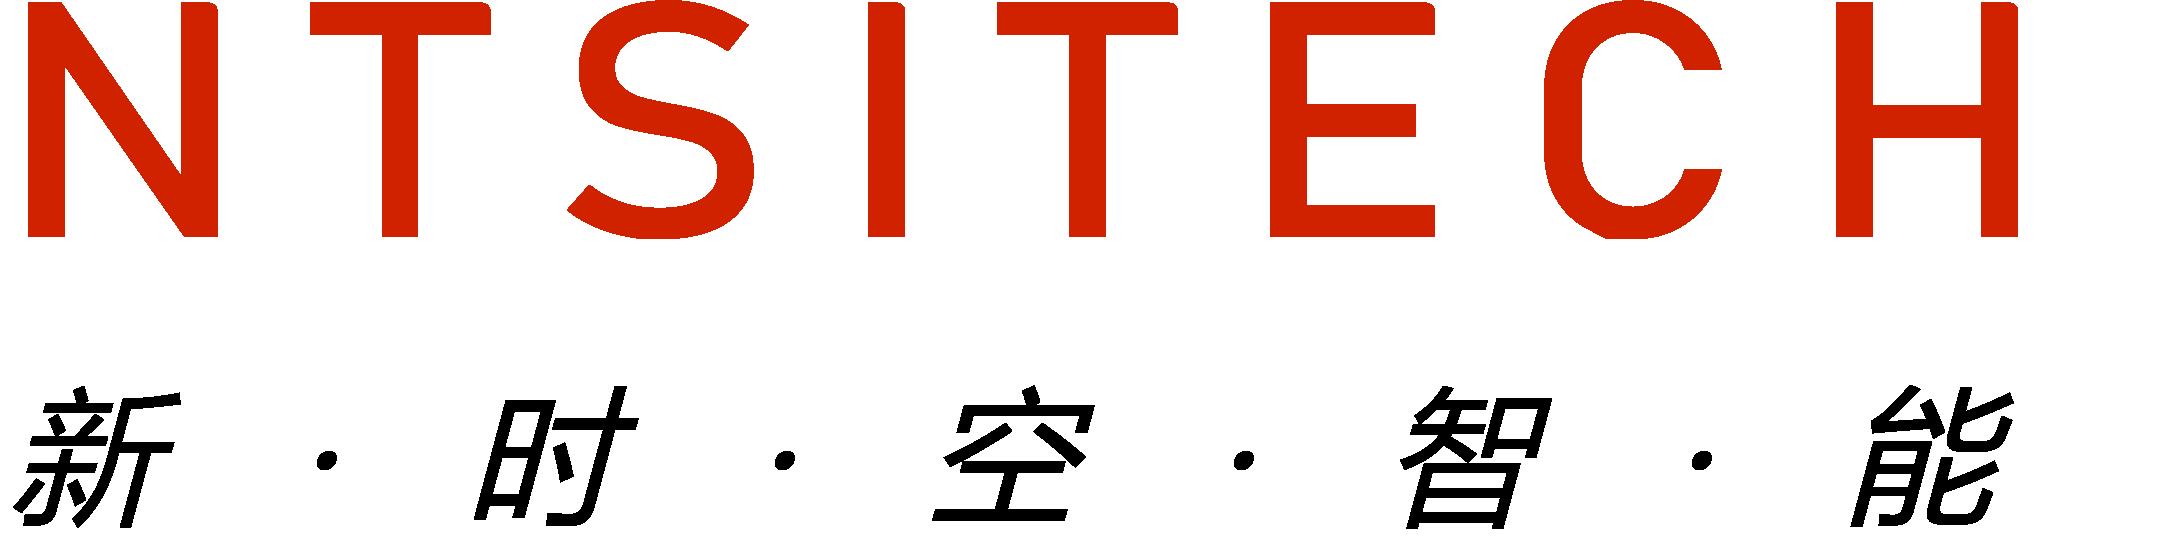 logo(中英文).png